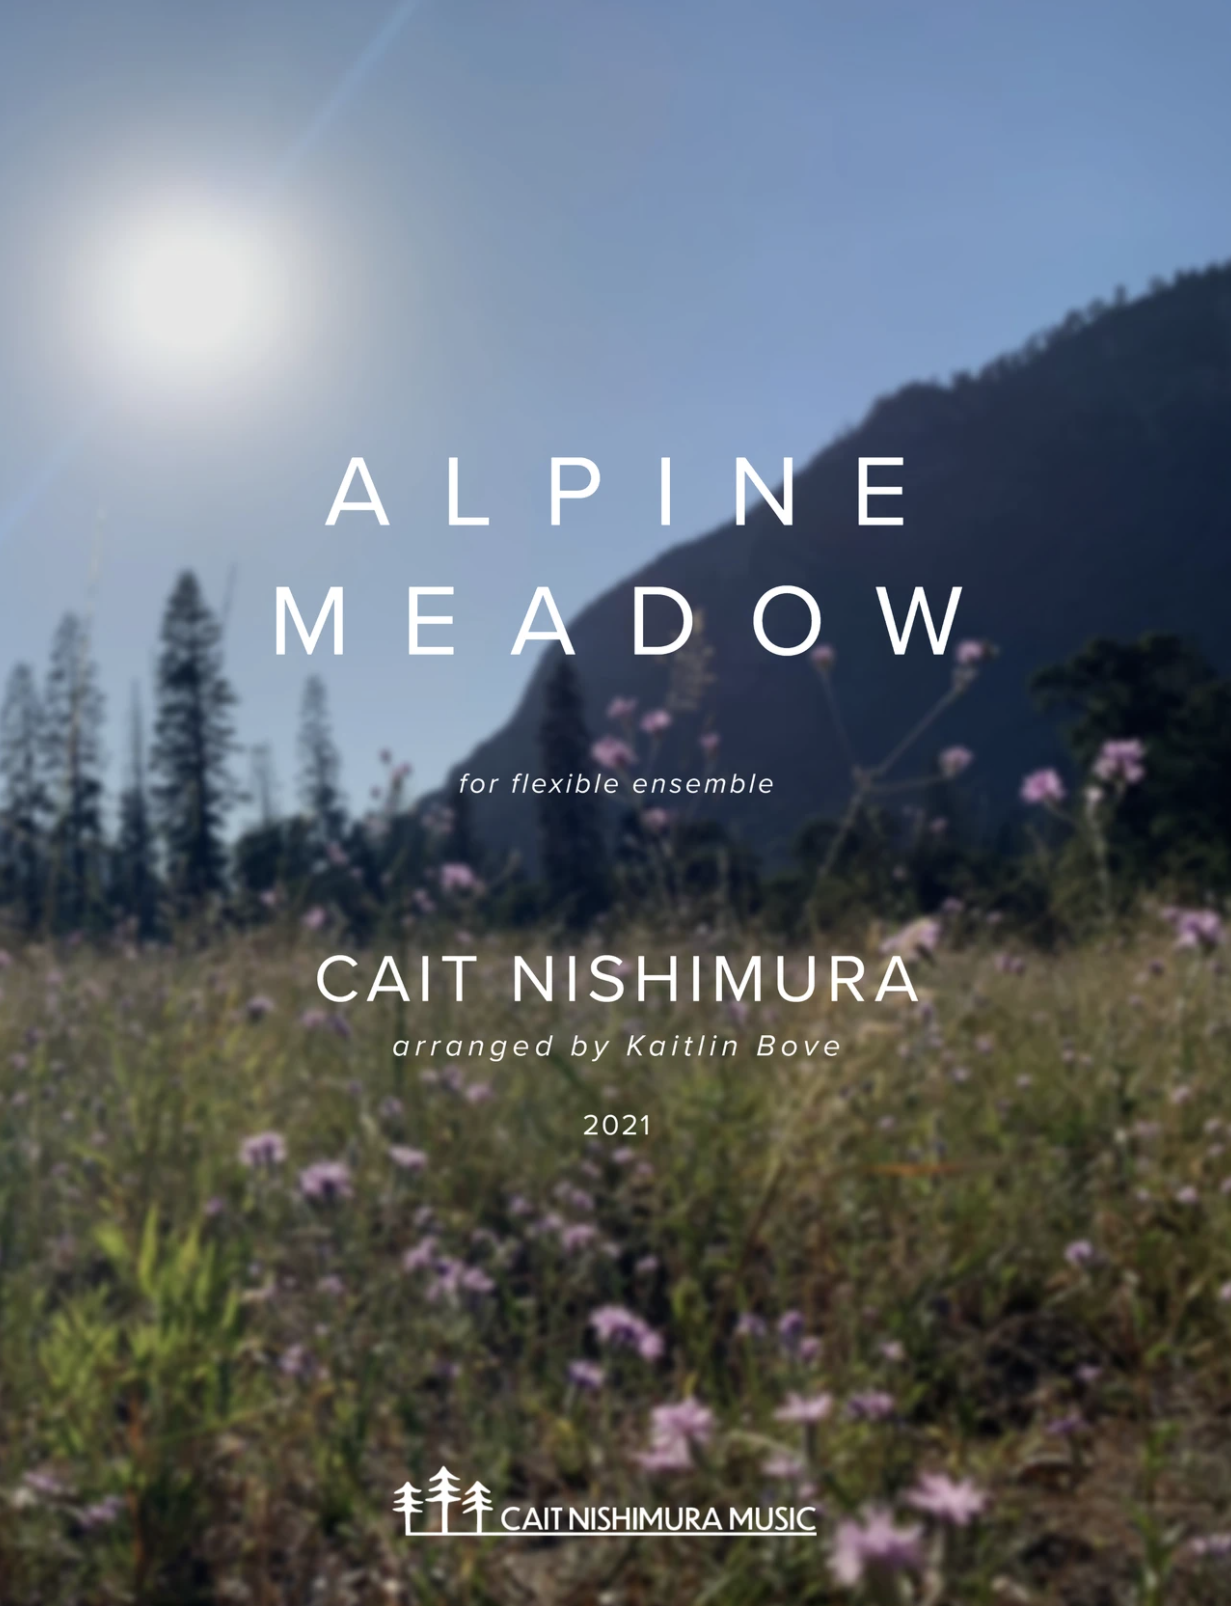 Alpine Meadow (Flex Version) by Cait Nishimura